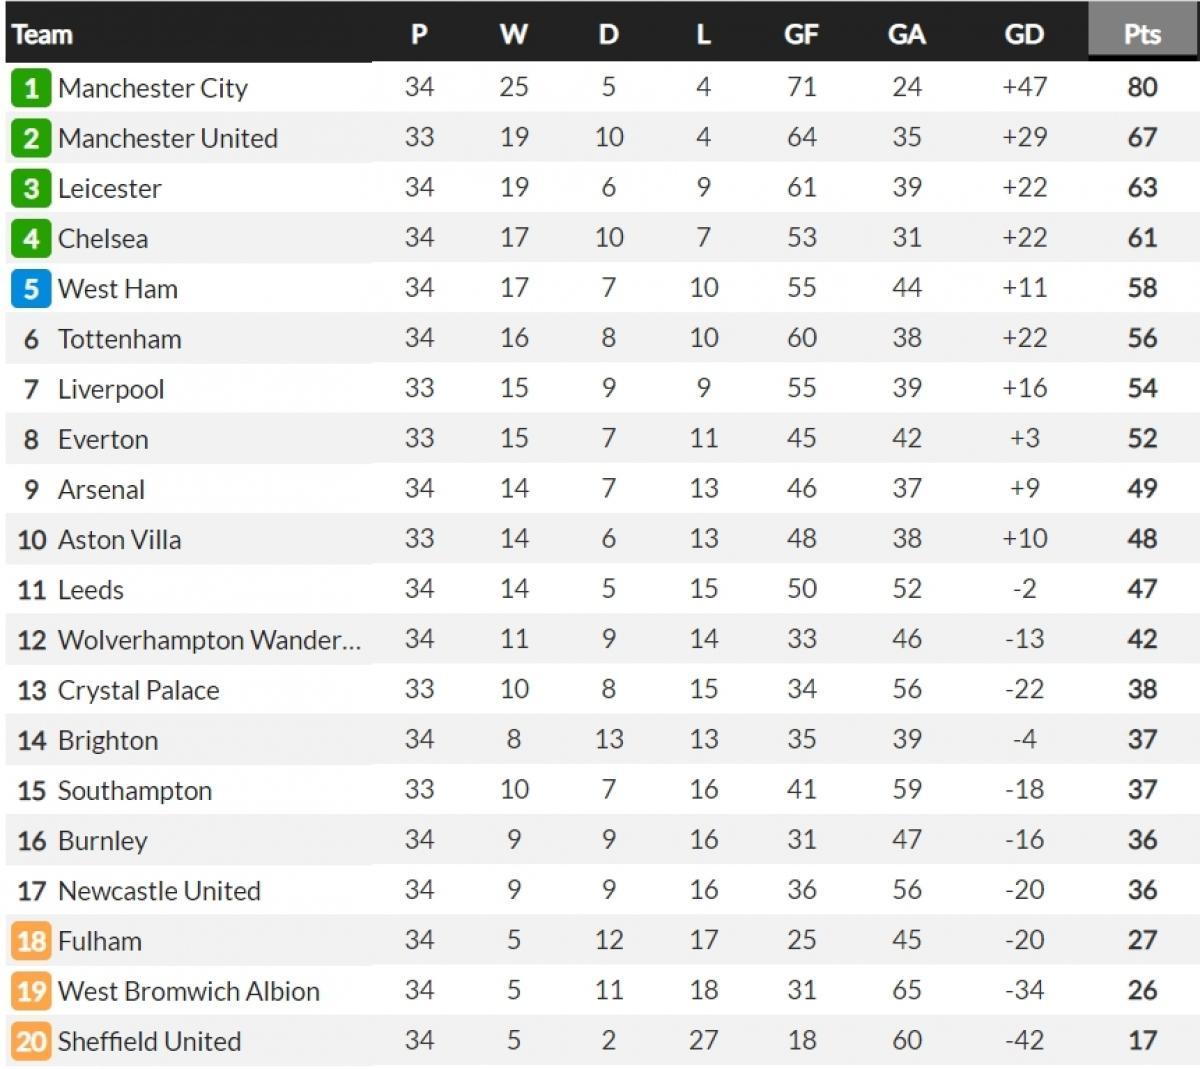 BXH Premier League trước vòng 35. (Ảnh: Whoscored)